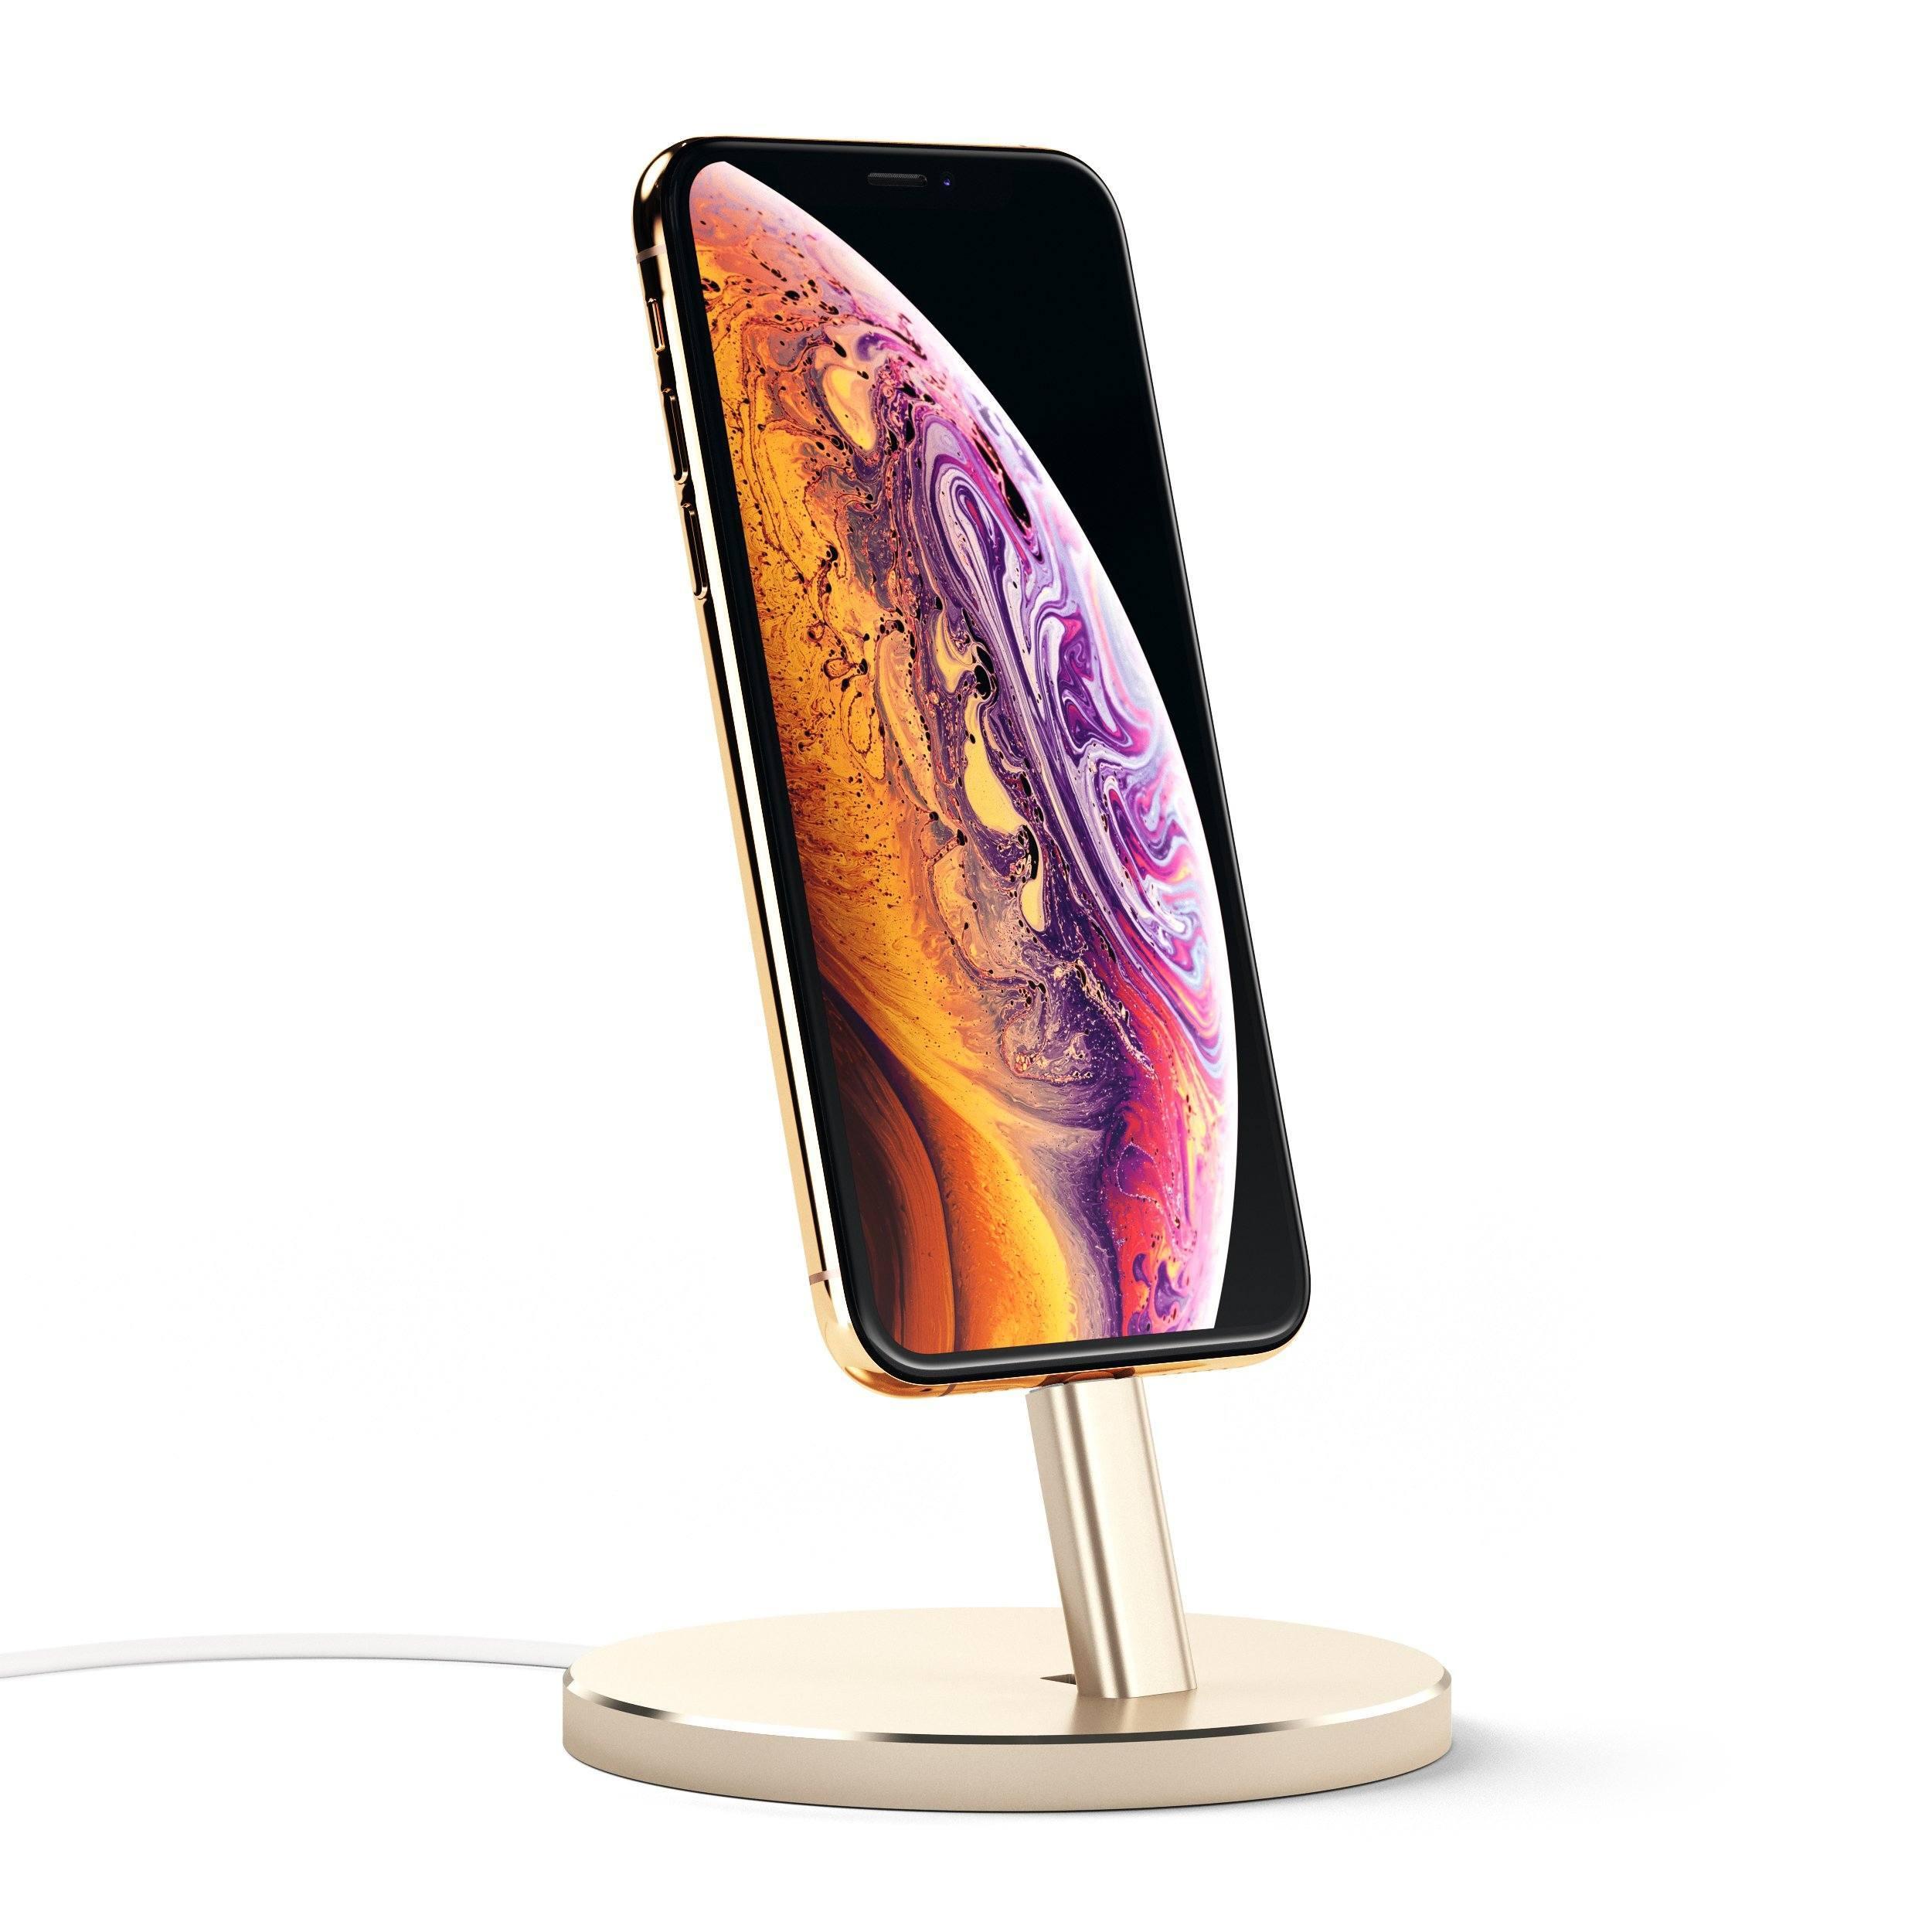 Dokovací stanice pro iPhone - Satechi, Aluminum Dock Gold